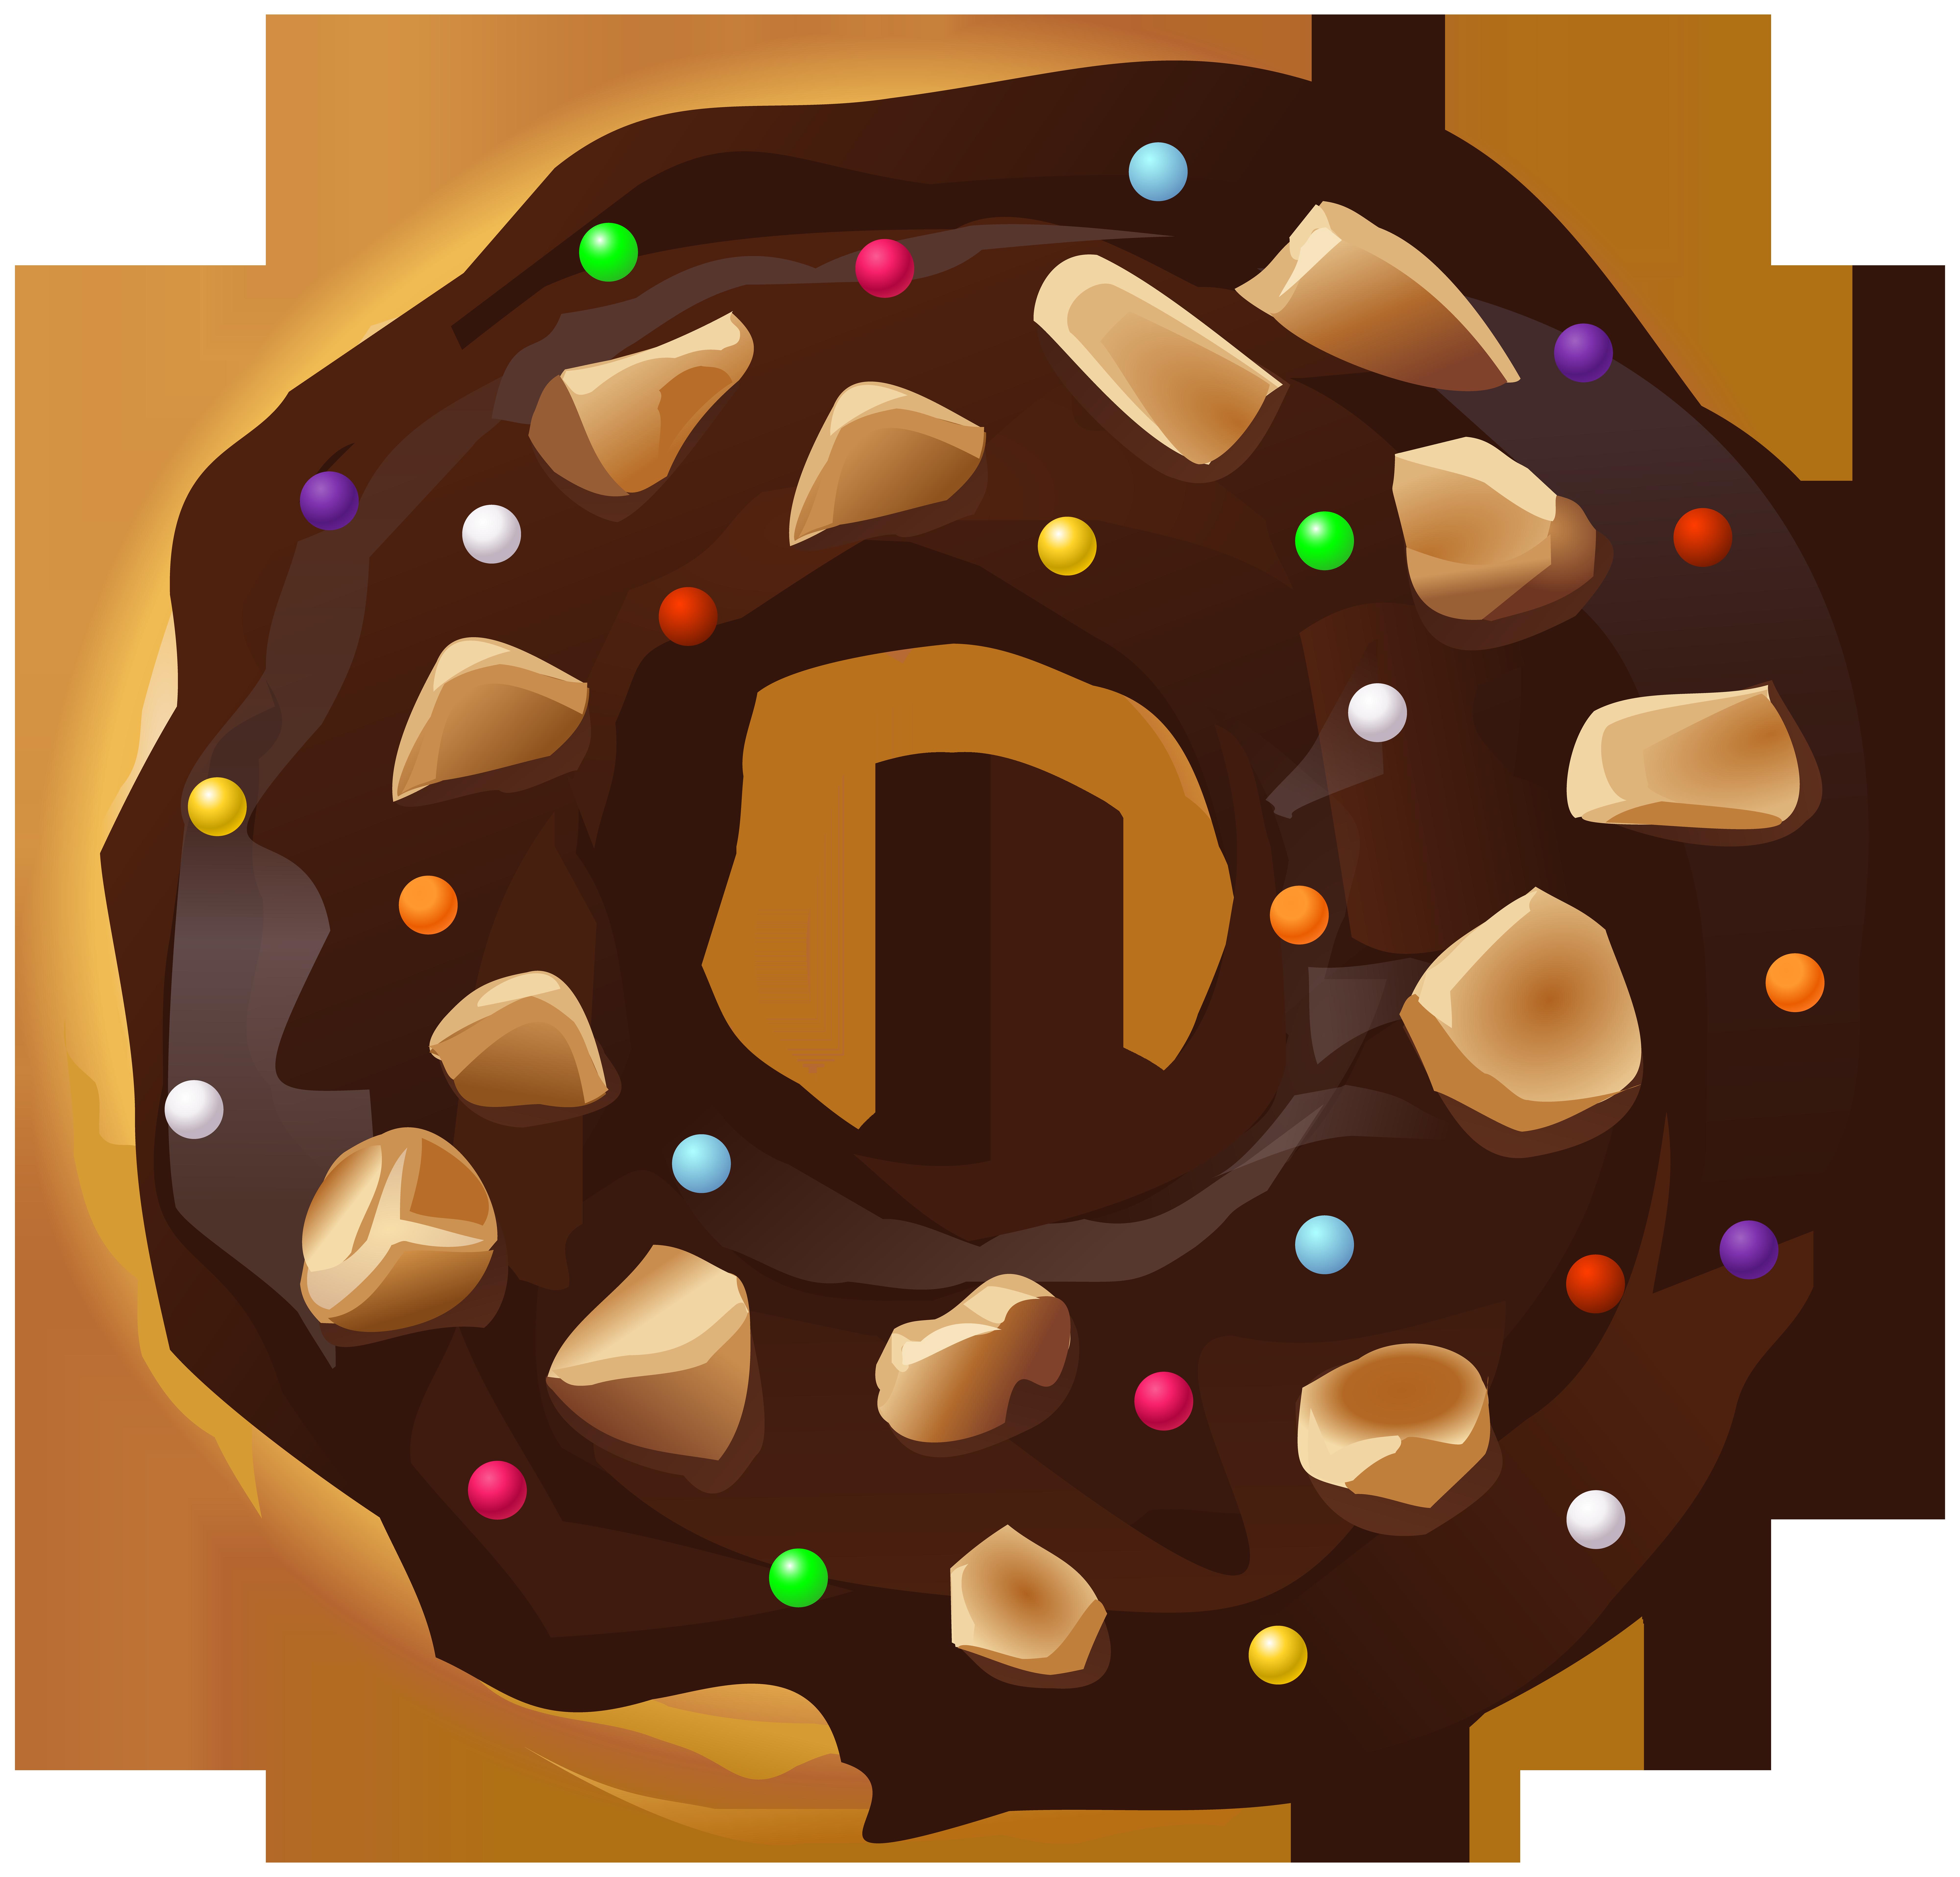 Donut clipart donut cake. Donuts chocolate clip art